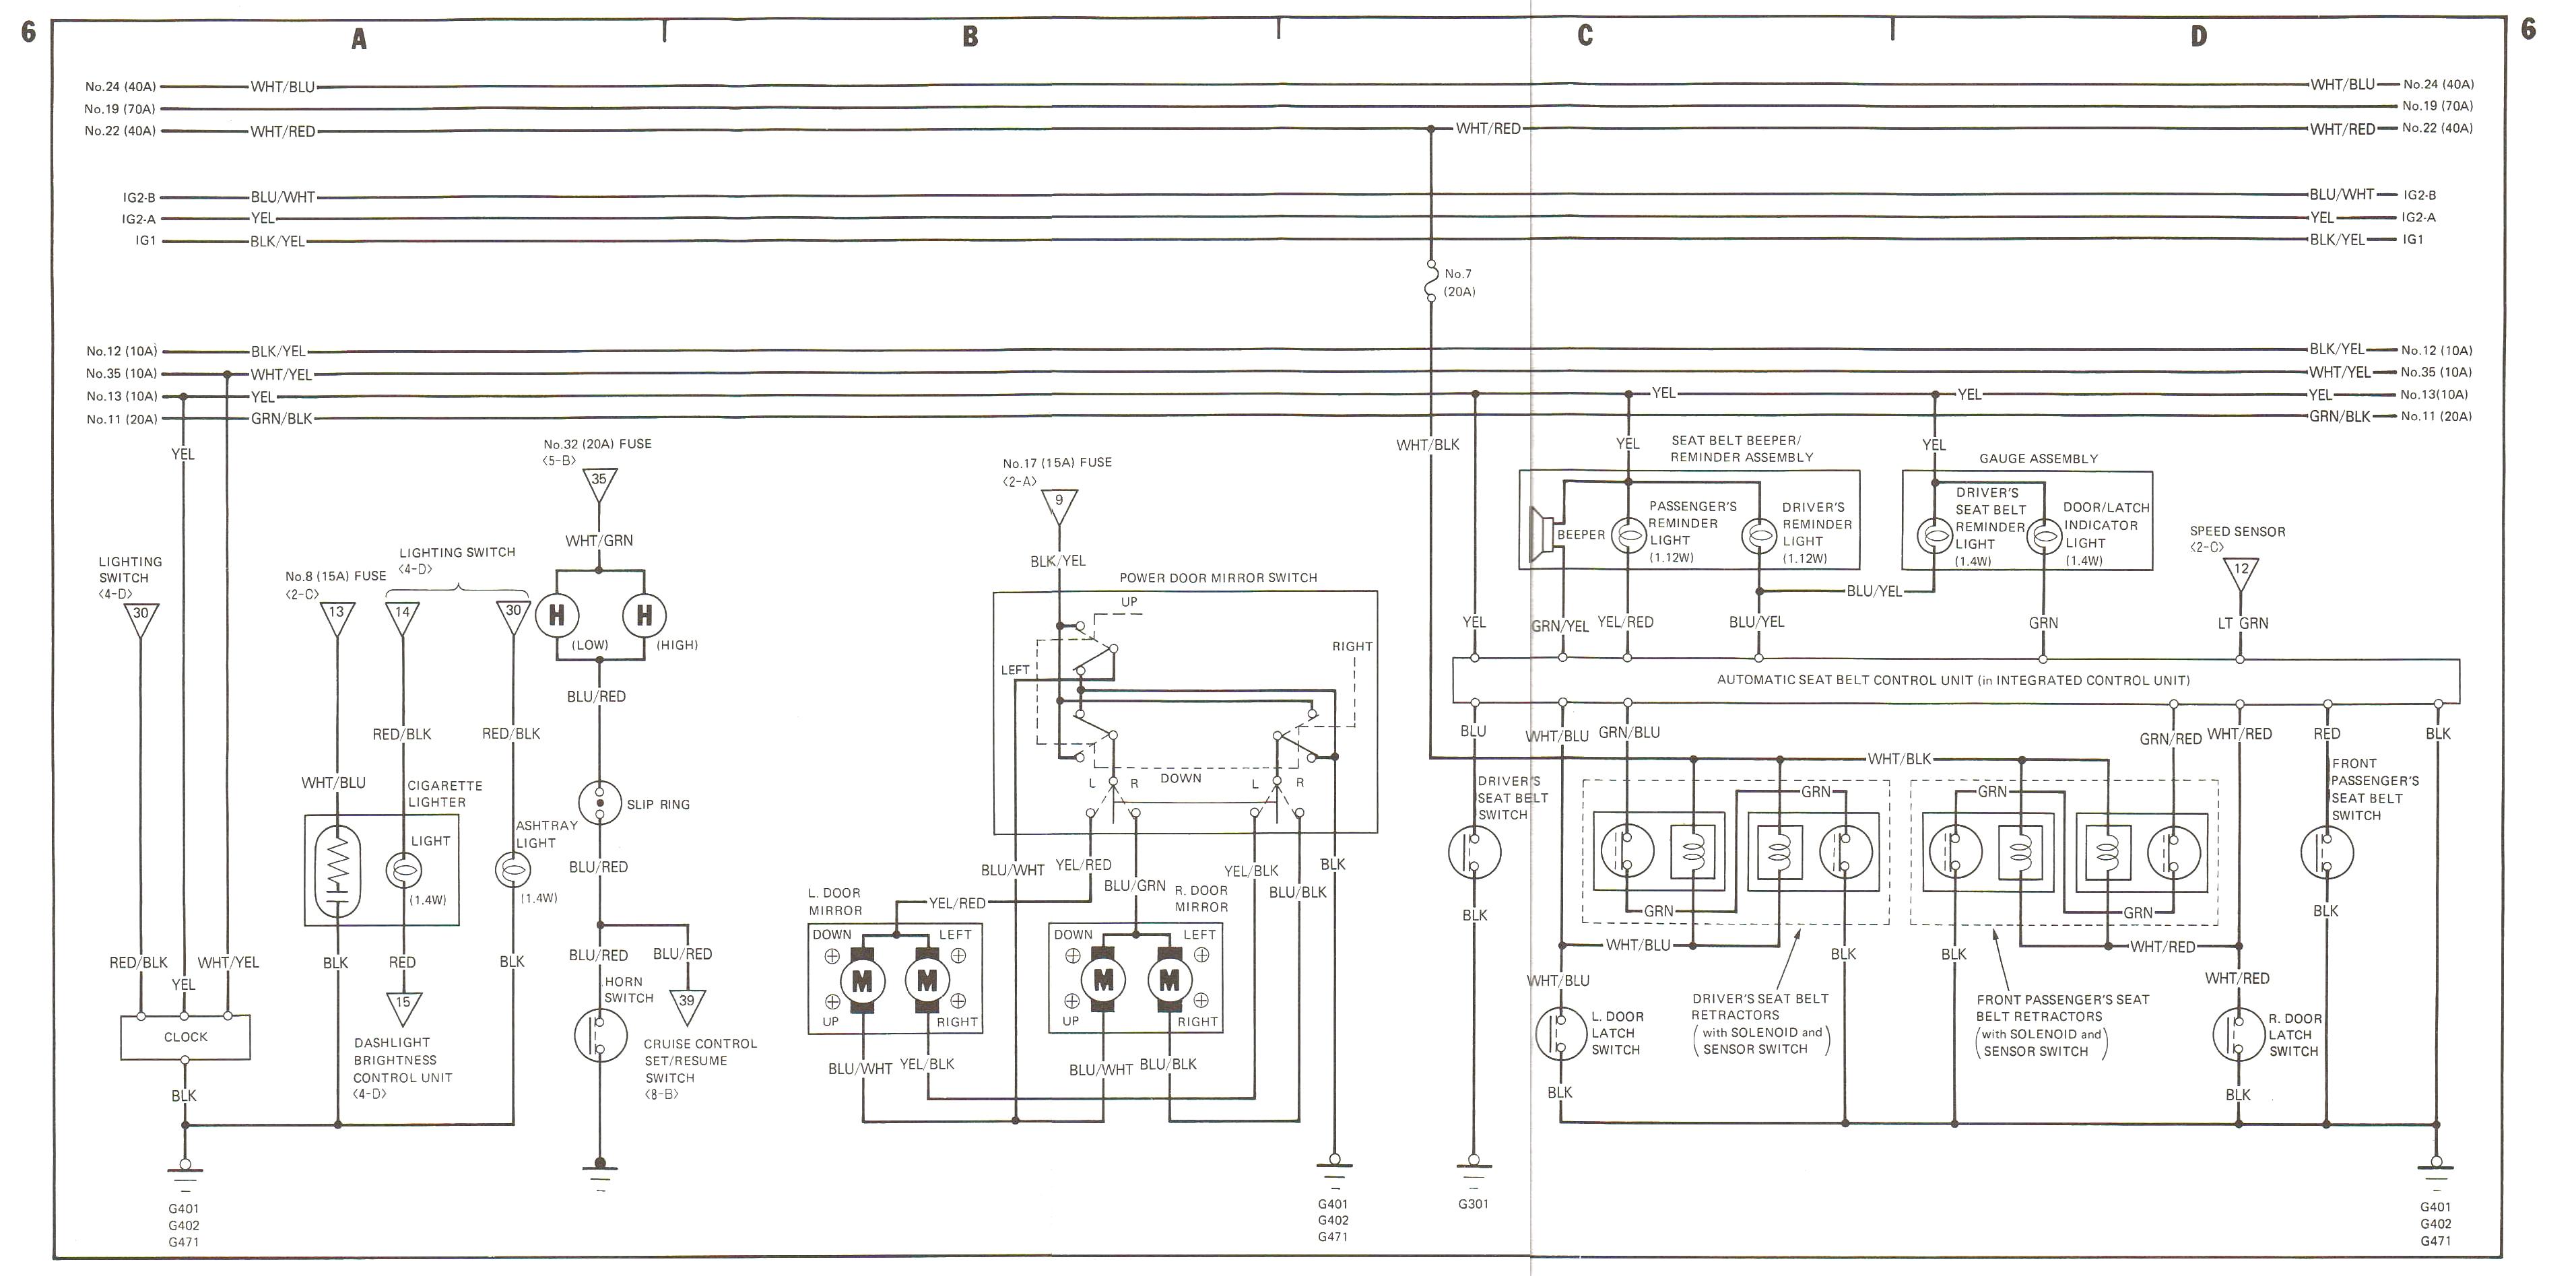 88-89 Wiring Diagrams